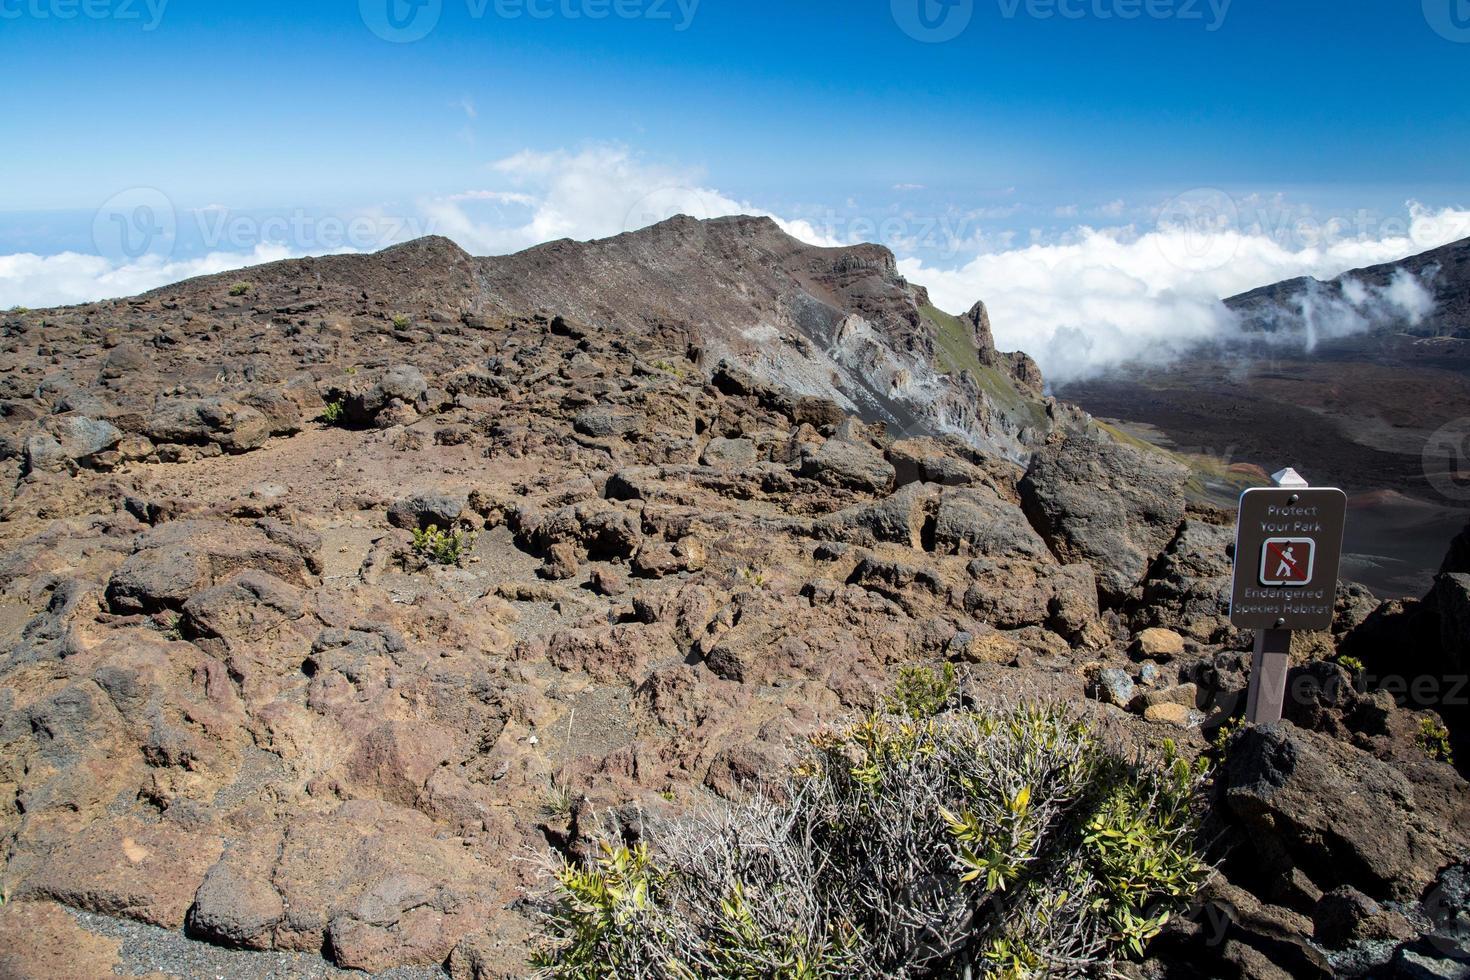 estados unidos - hawaii - maui, parque nacional haleakala foto